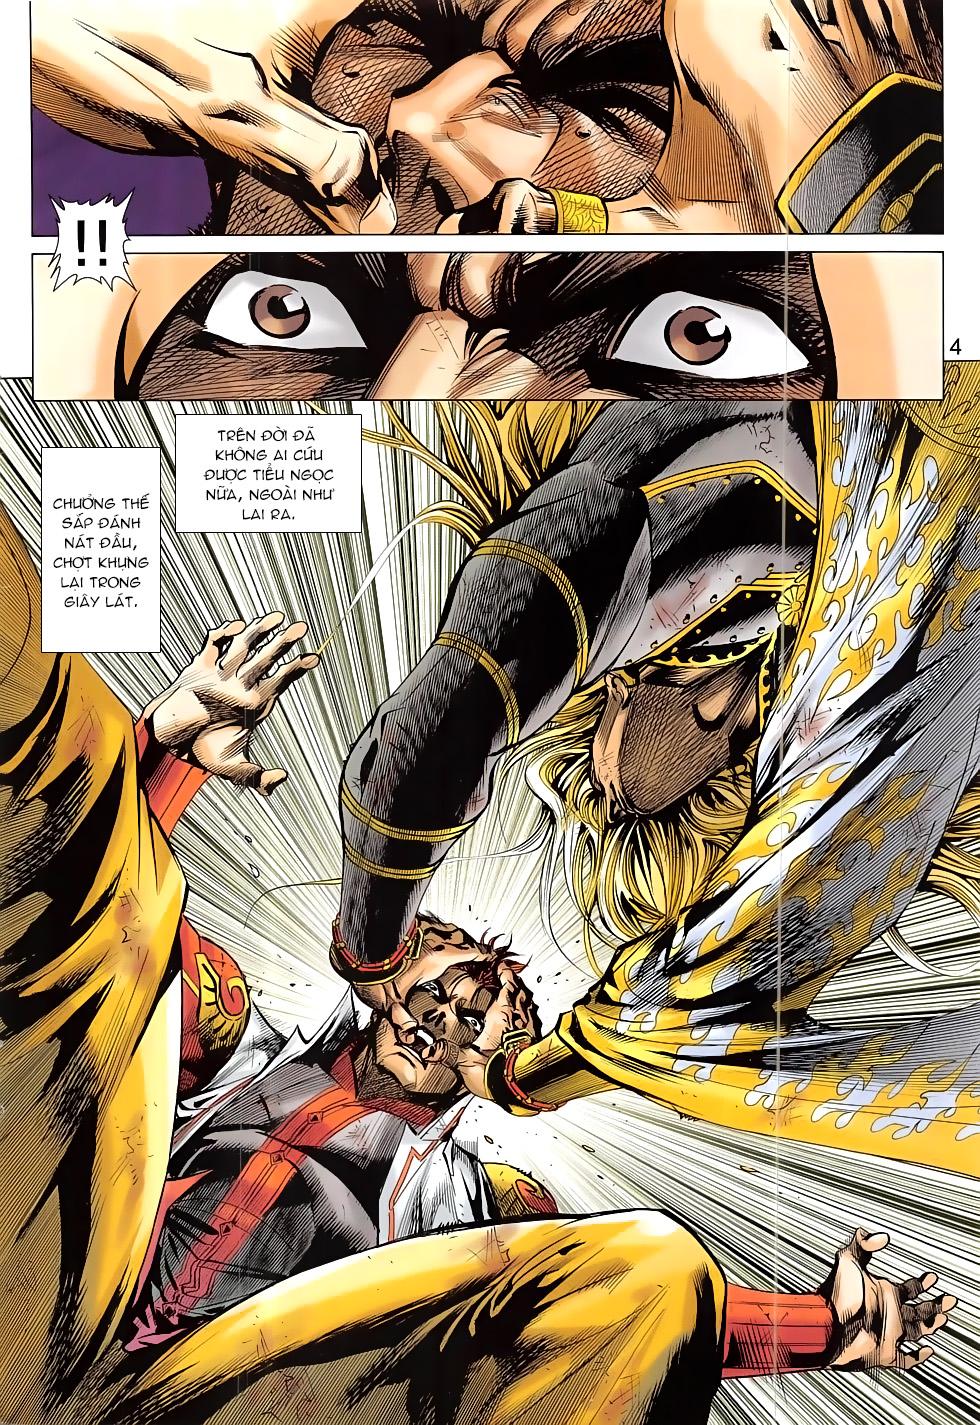 Thần Chưởng chap 24 – End Trang 4 - Mangak.info